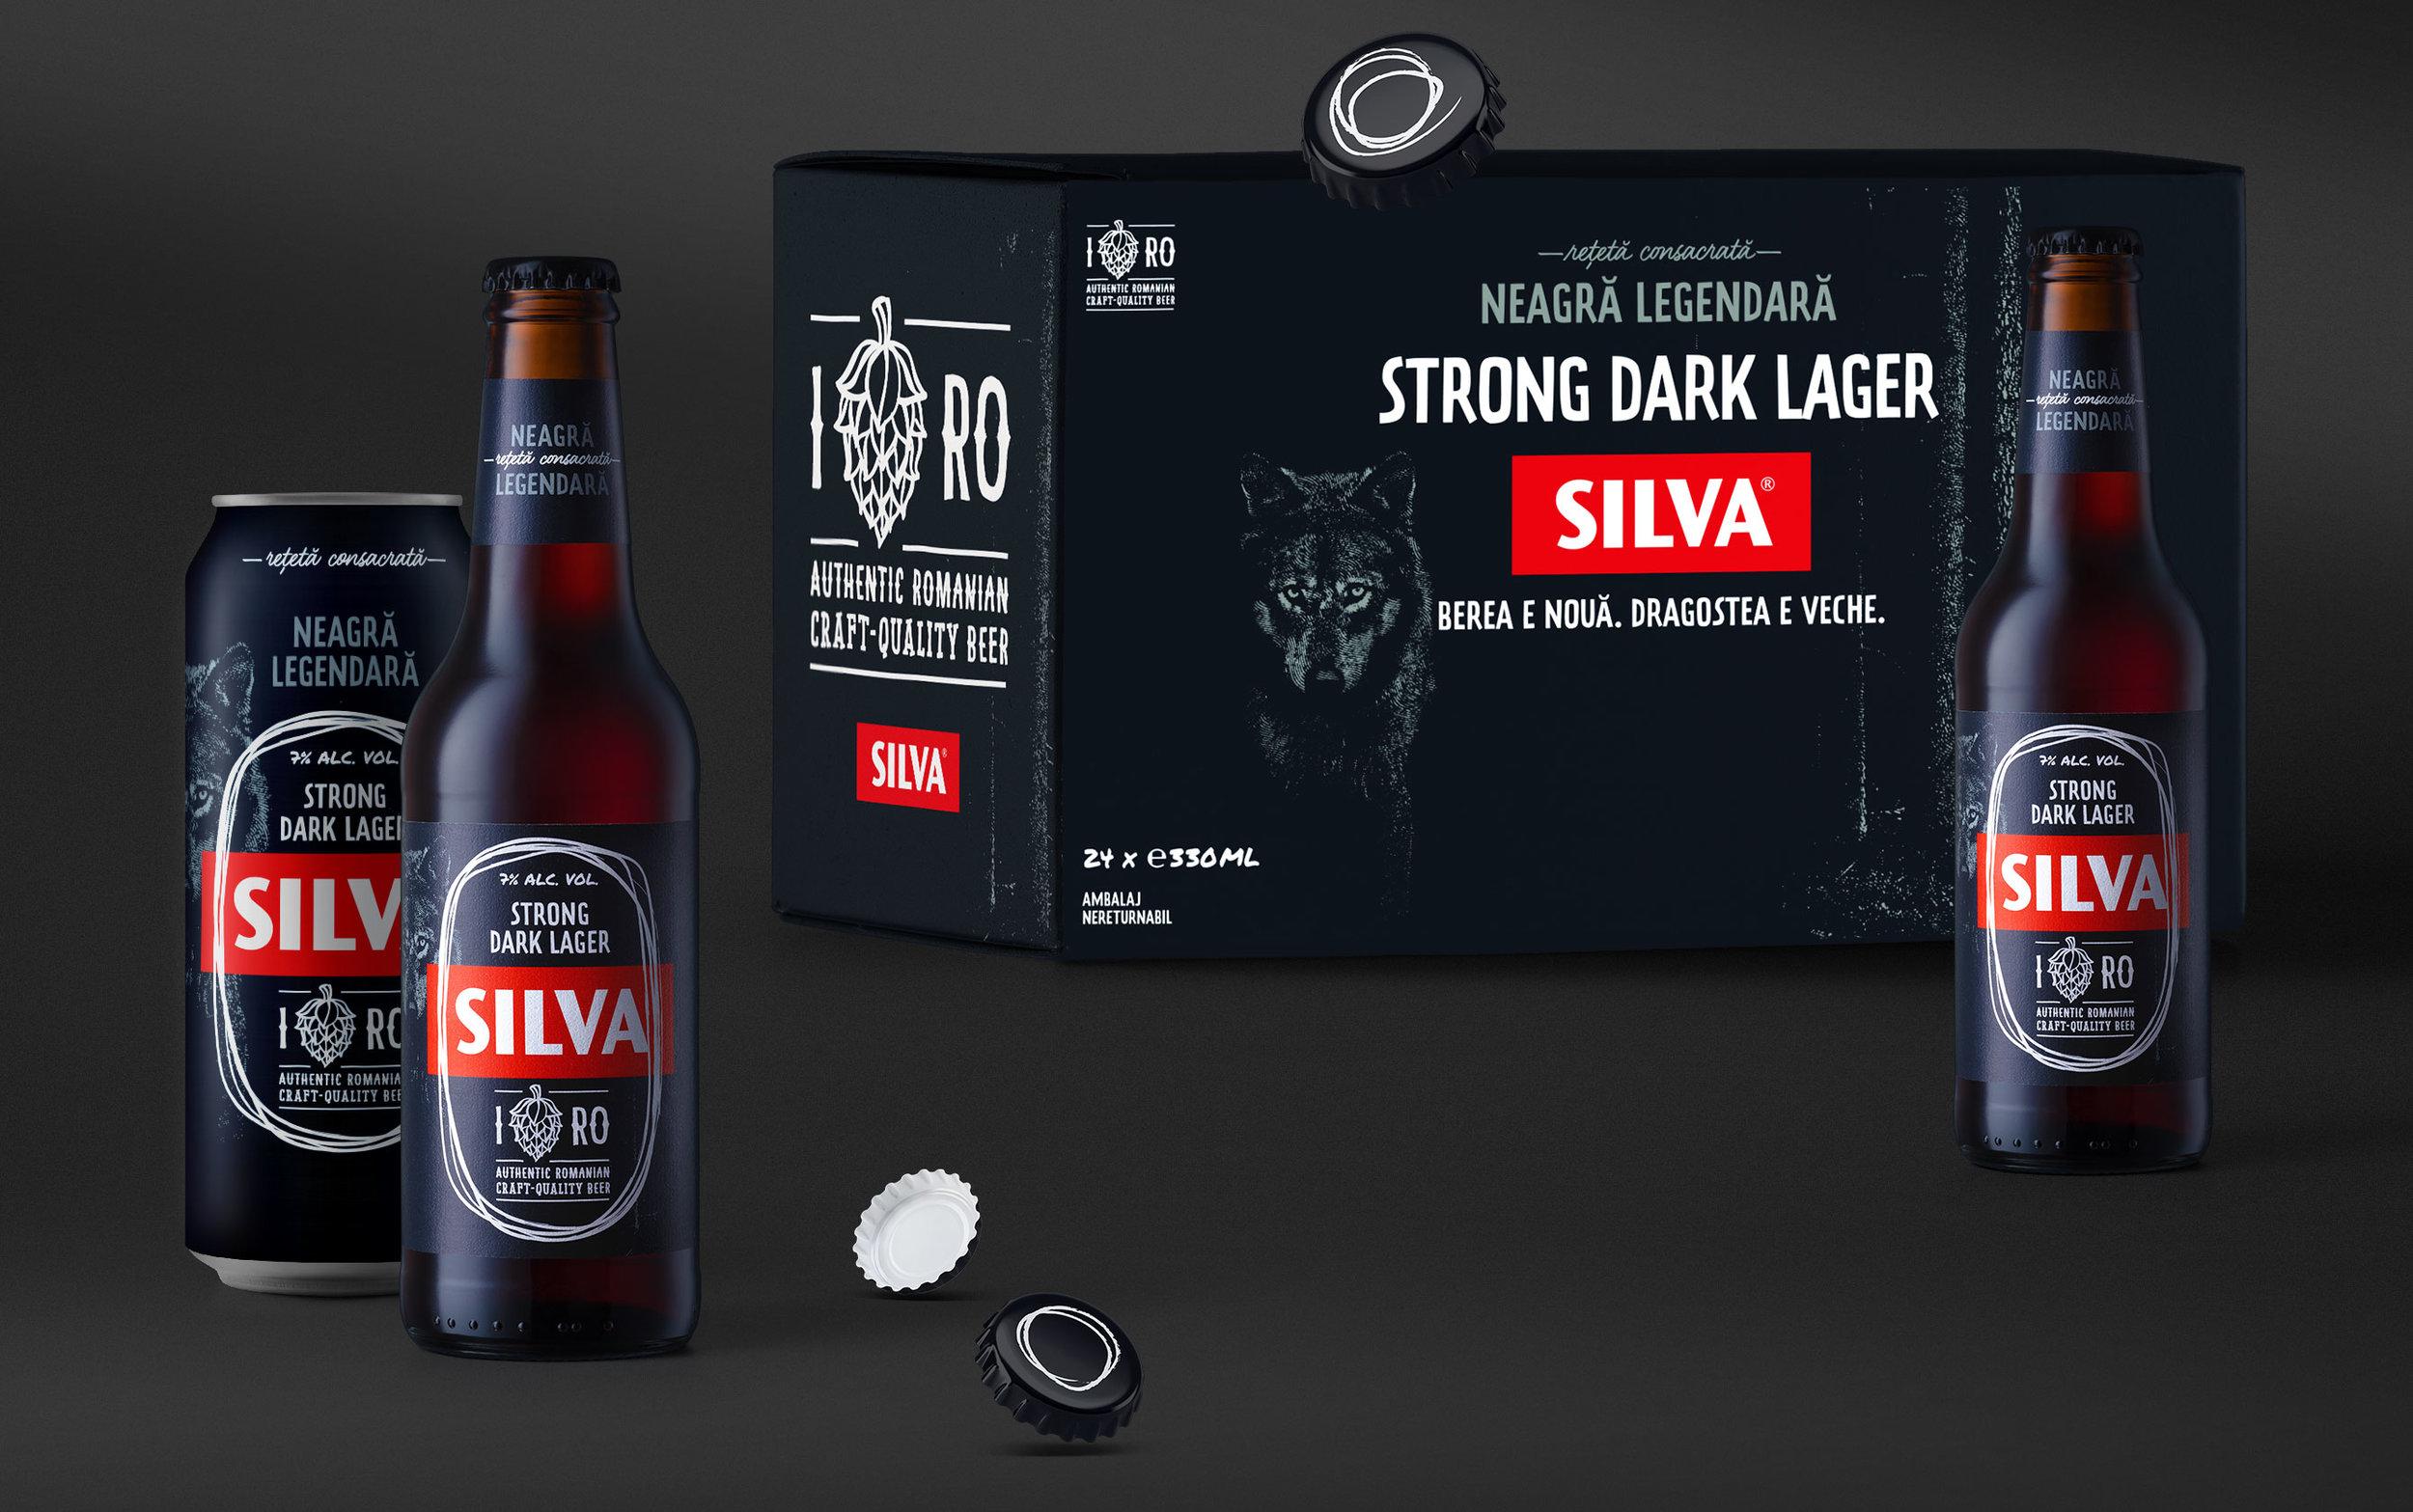 06-Silva-Strong-Dark-Lager-Packaging-Design-by-Brandient.jpg